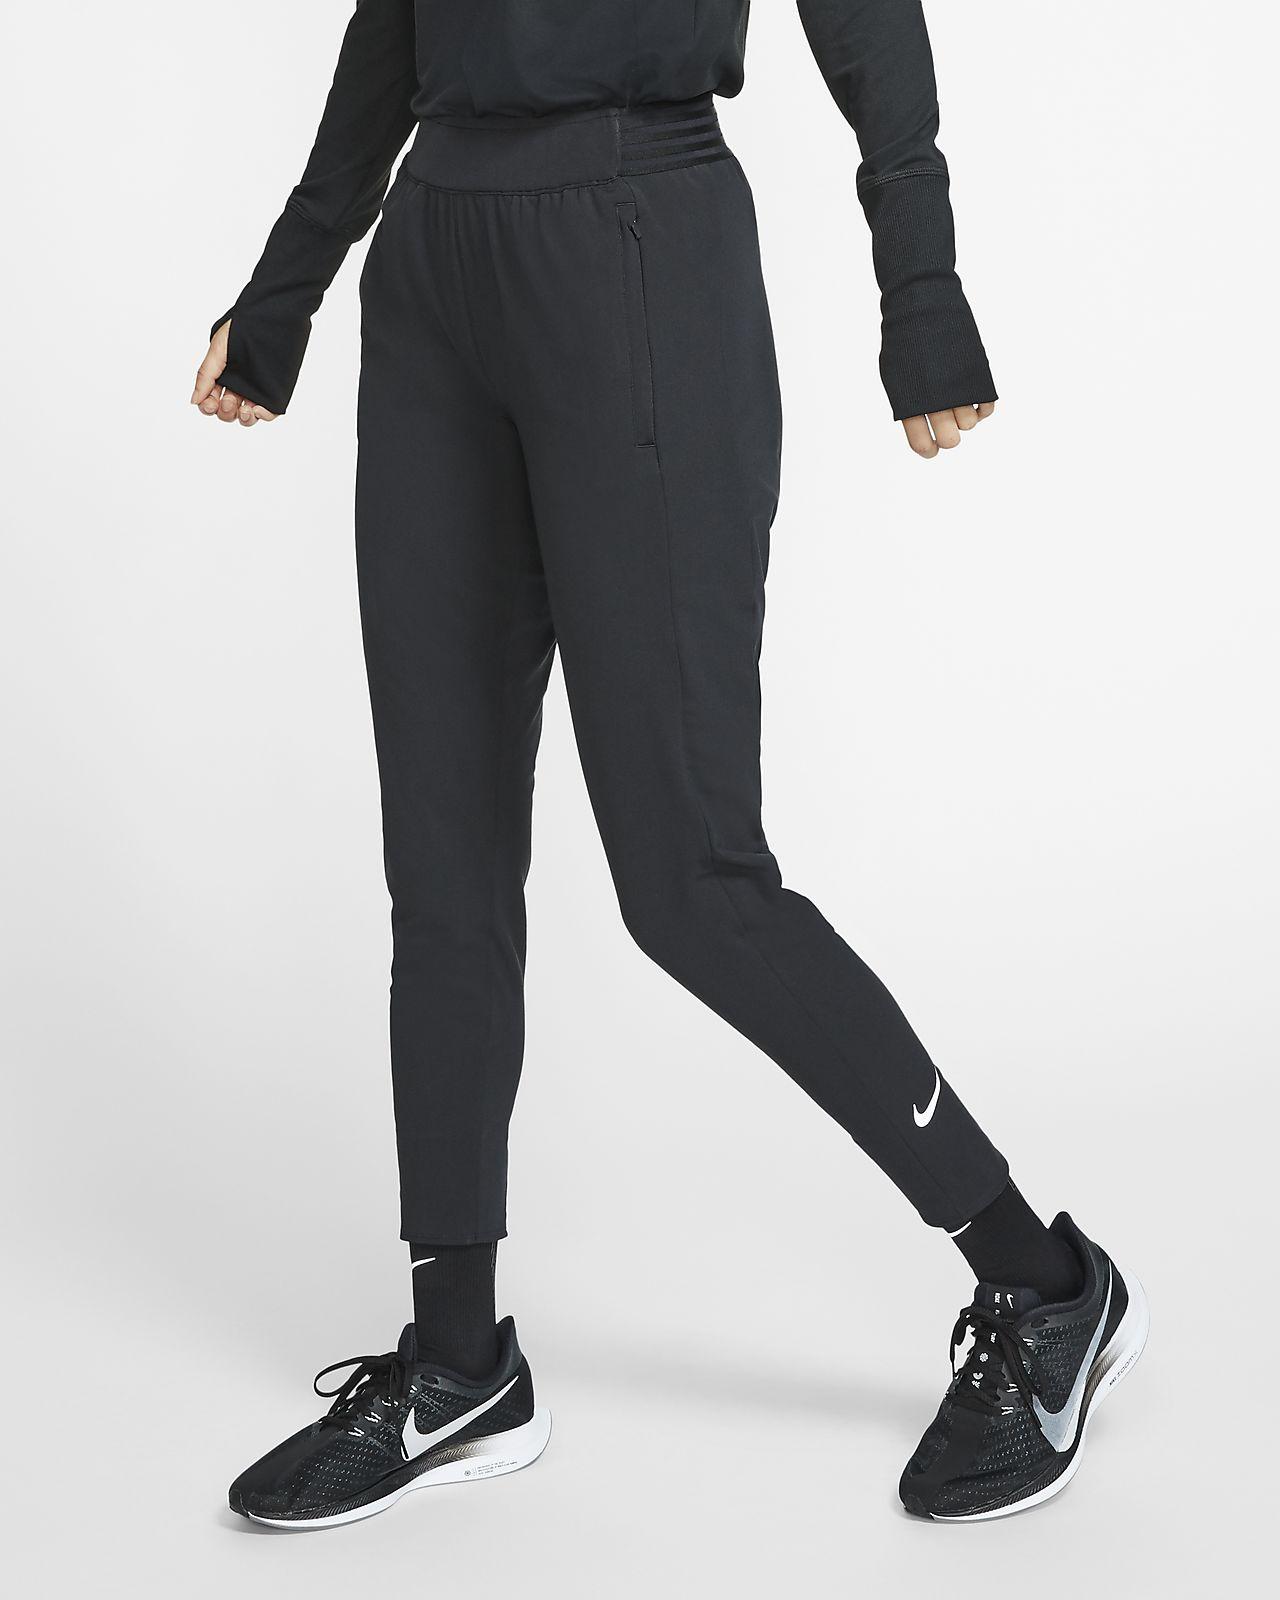 Sudor Zapatillas Nike Flyknit Air Max Chile playeras Mujer